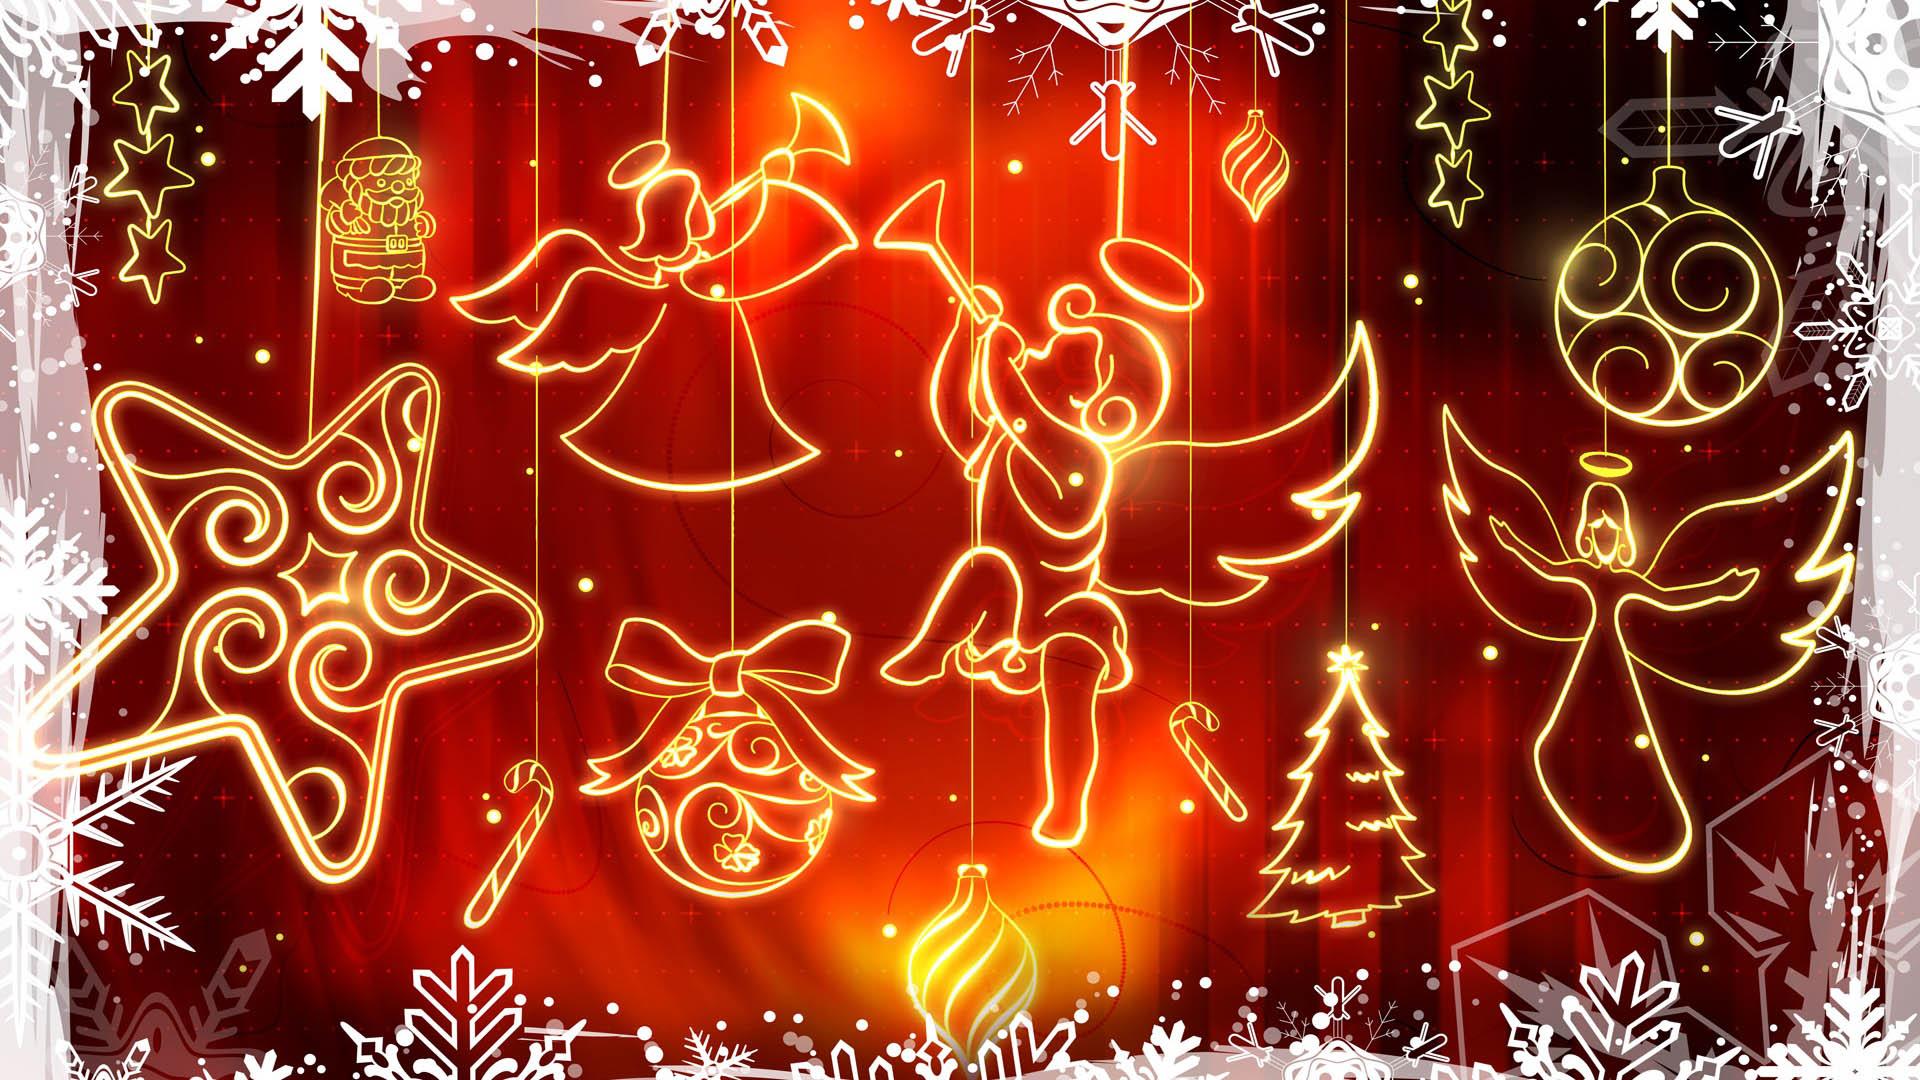 Merry Christmas Full Hd , HD Wallpaper & Backgrounds